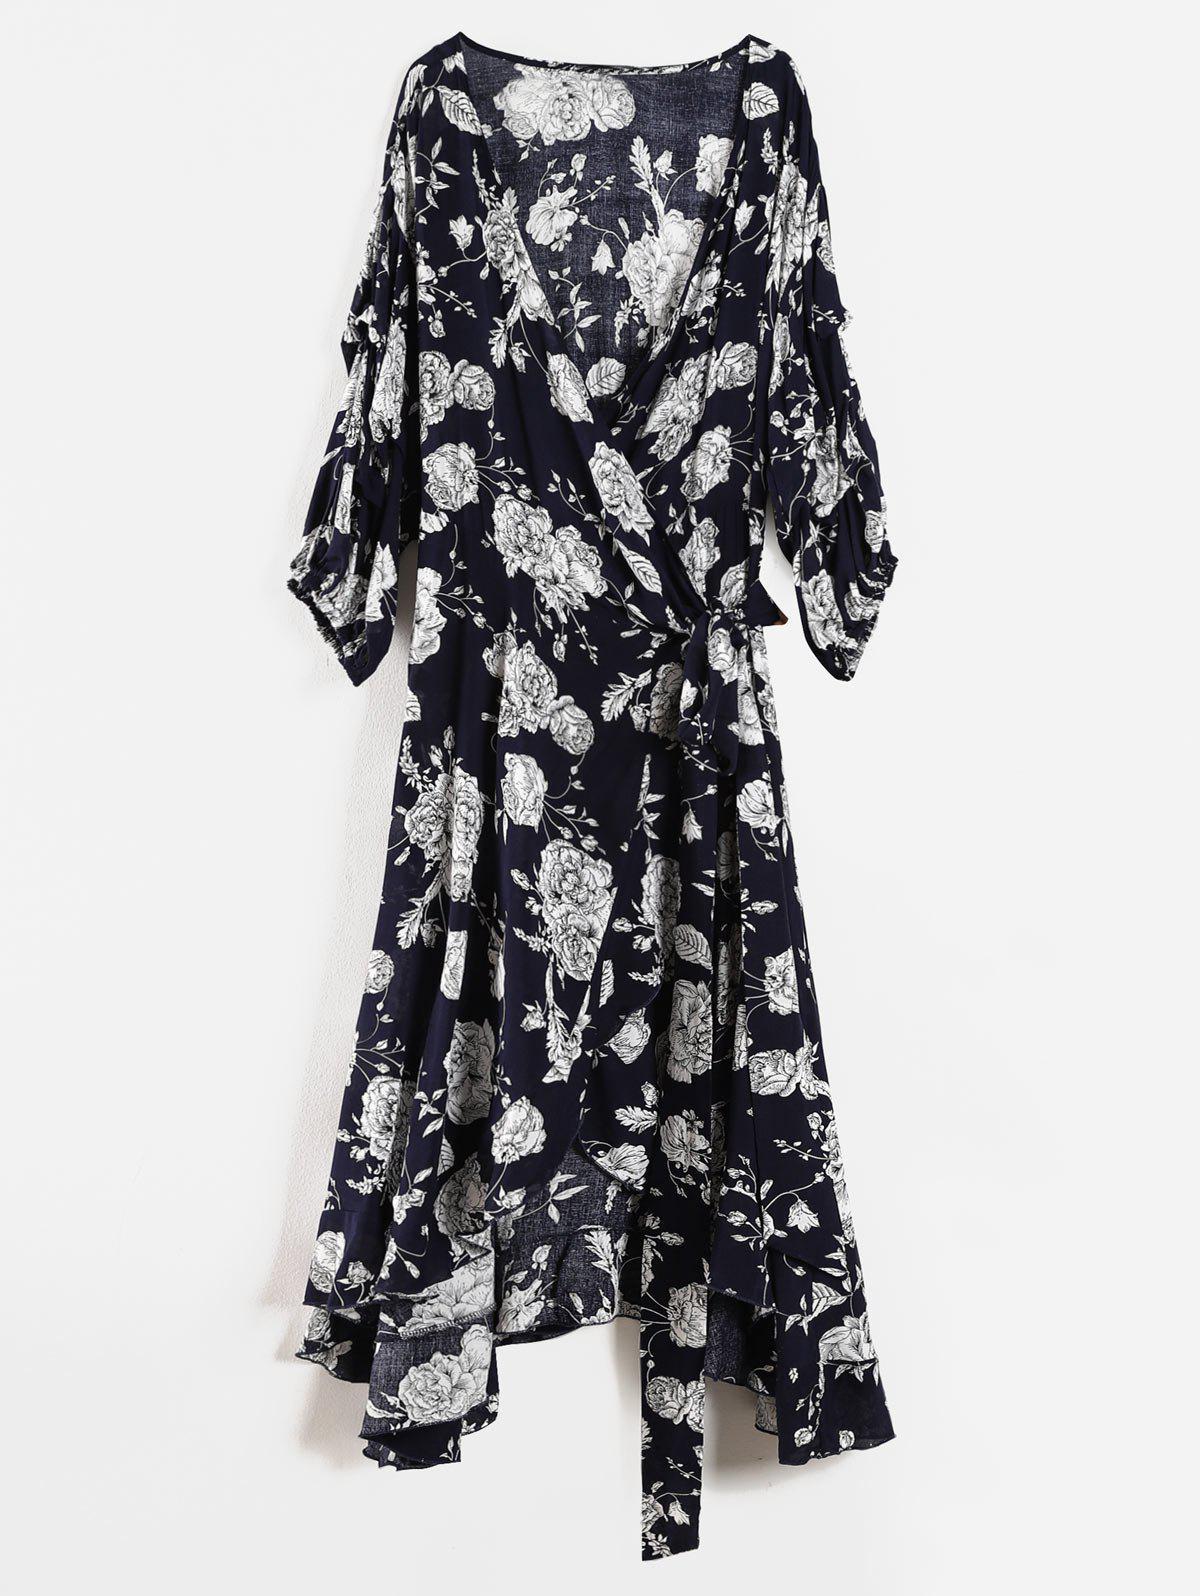 Floral Ruffle Plus Size Wrap Dress 298876604